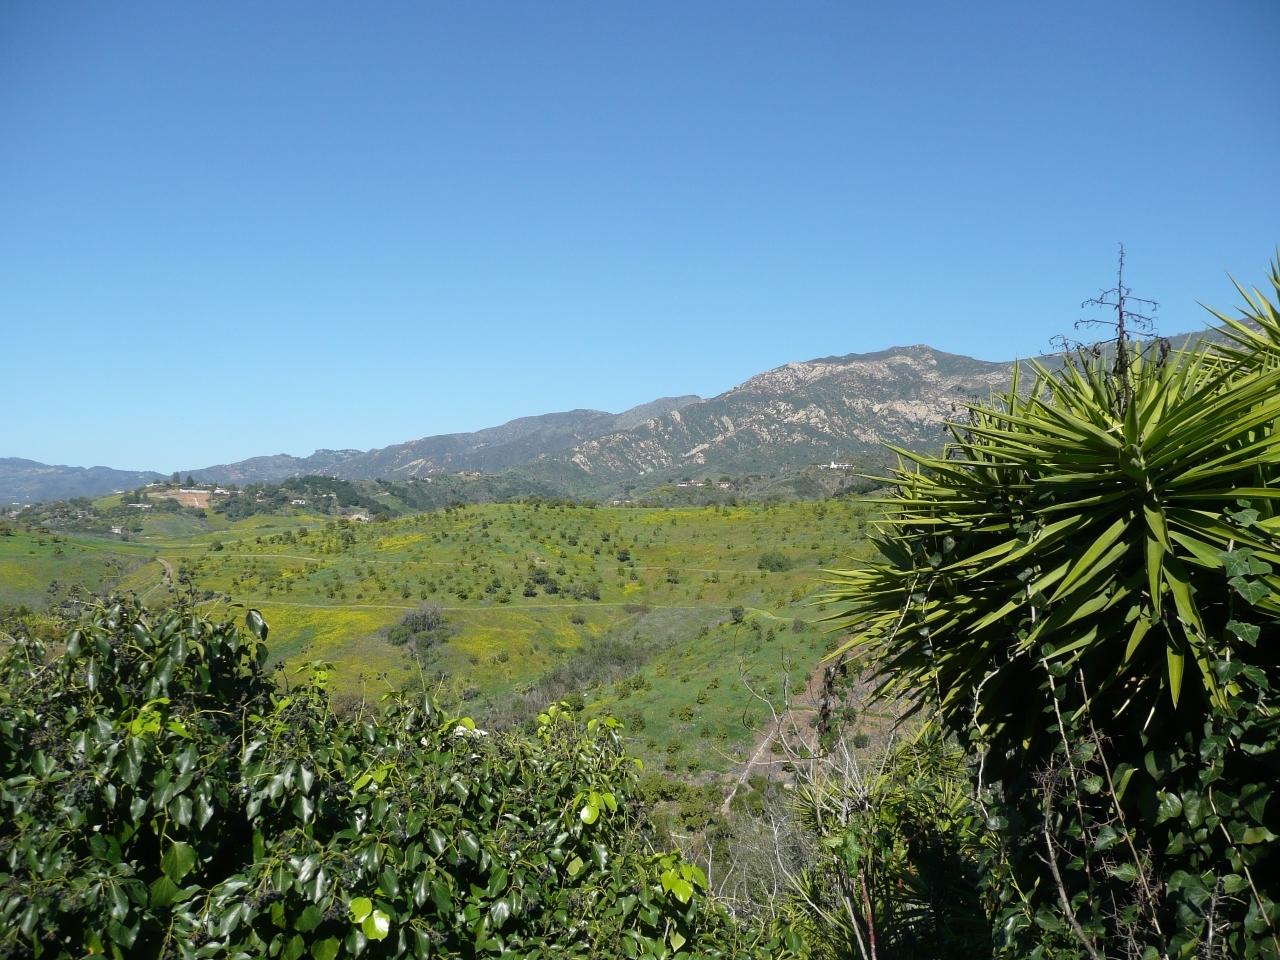 Property photo for 2875 Vista Elevada Santa Barbara, California 93105 - 13-515